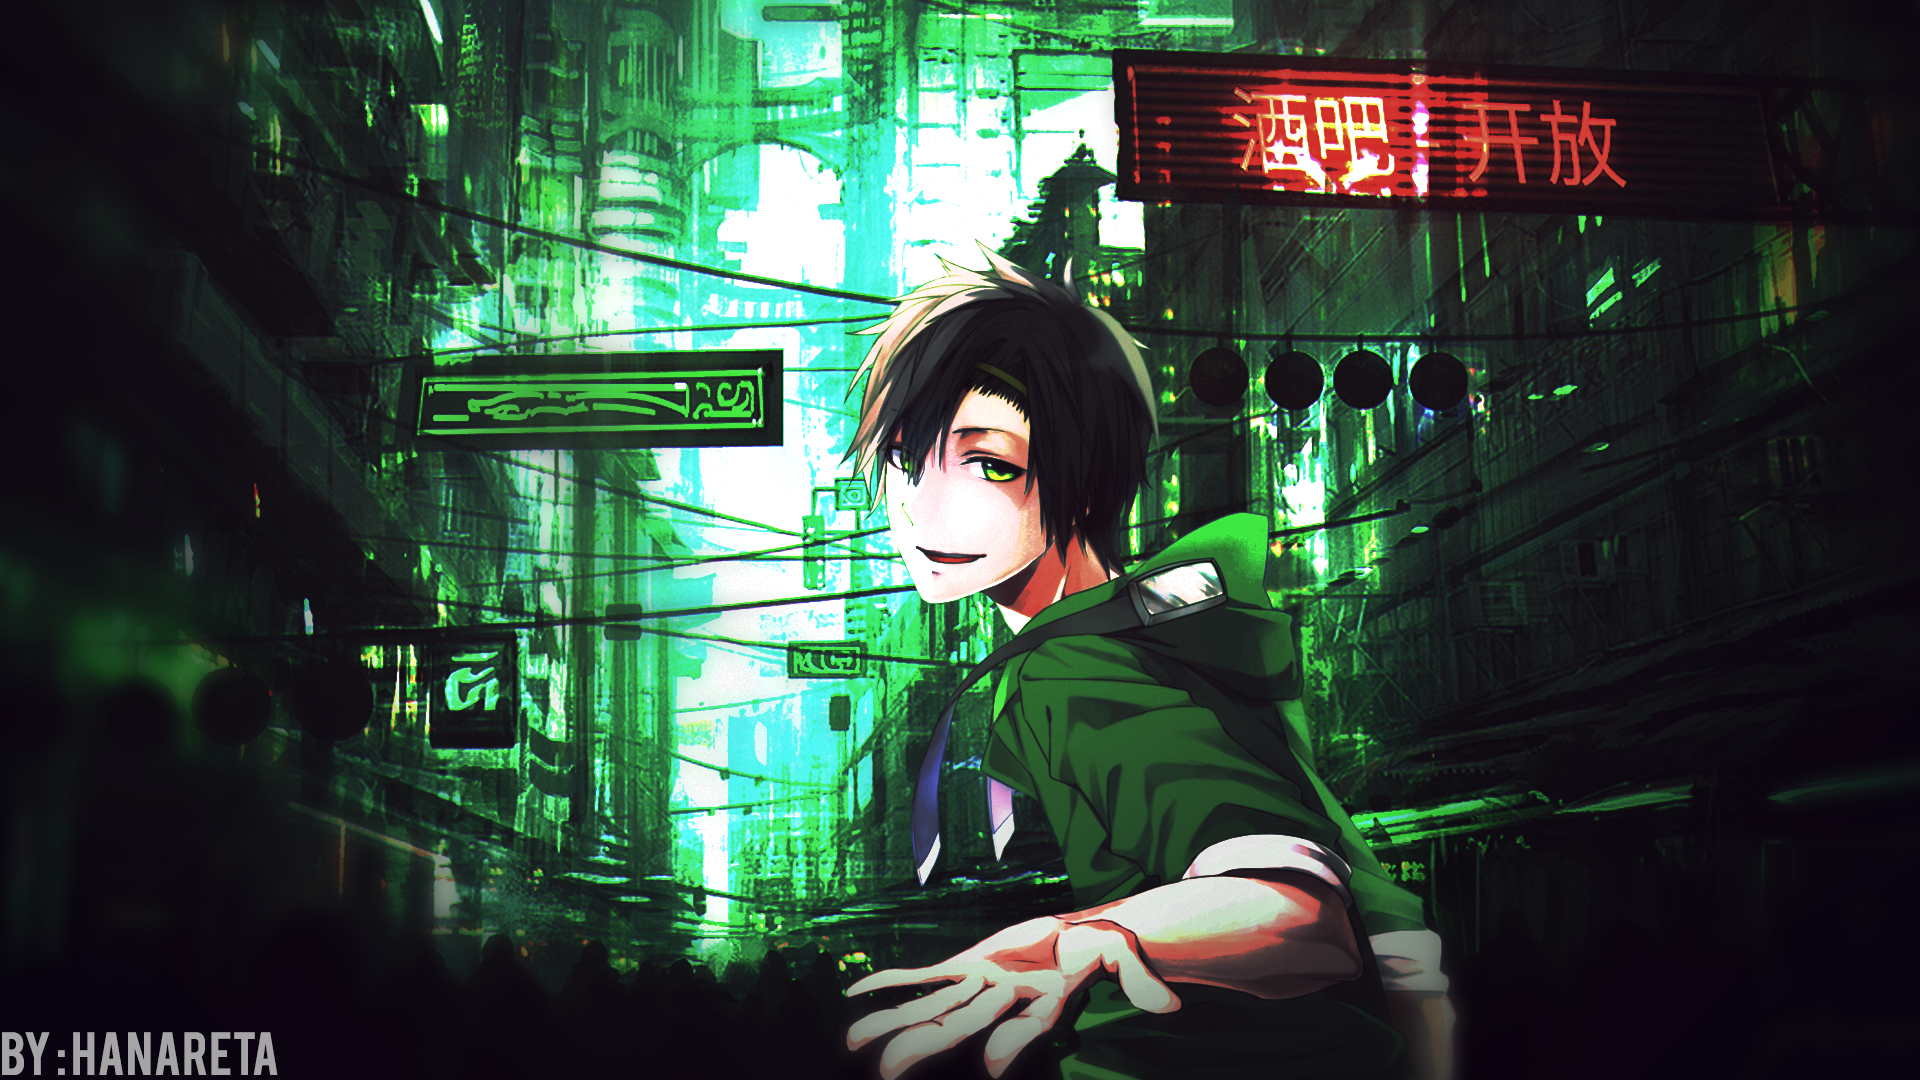 Downtown Anime Wallpaper Hd Fondo De Pantalla Hd Fondo